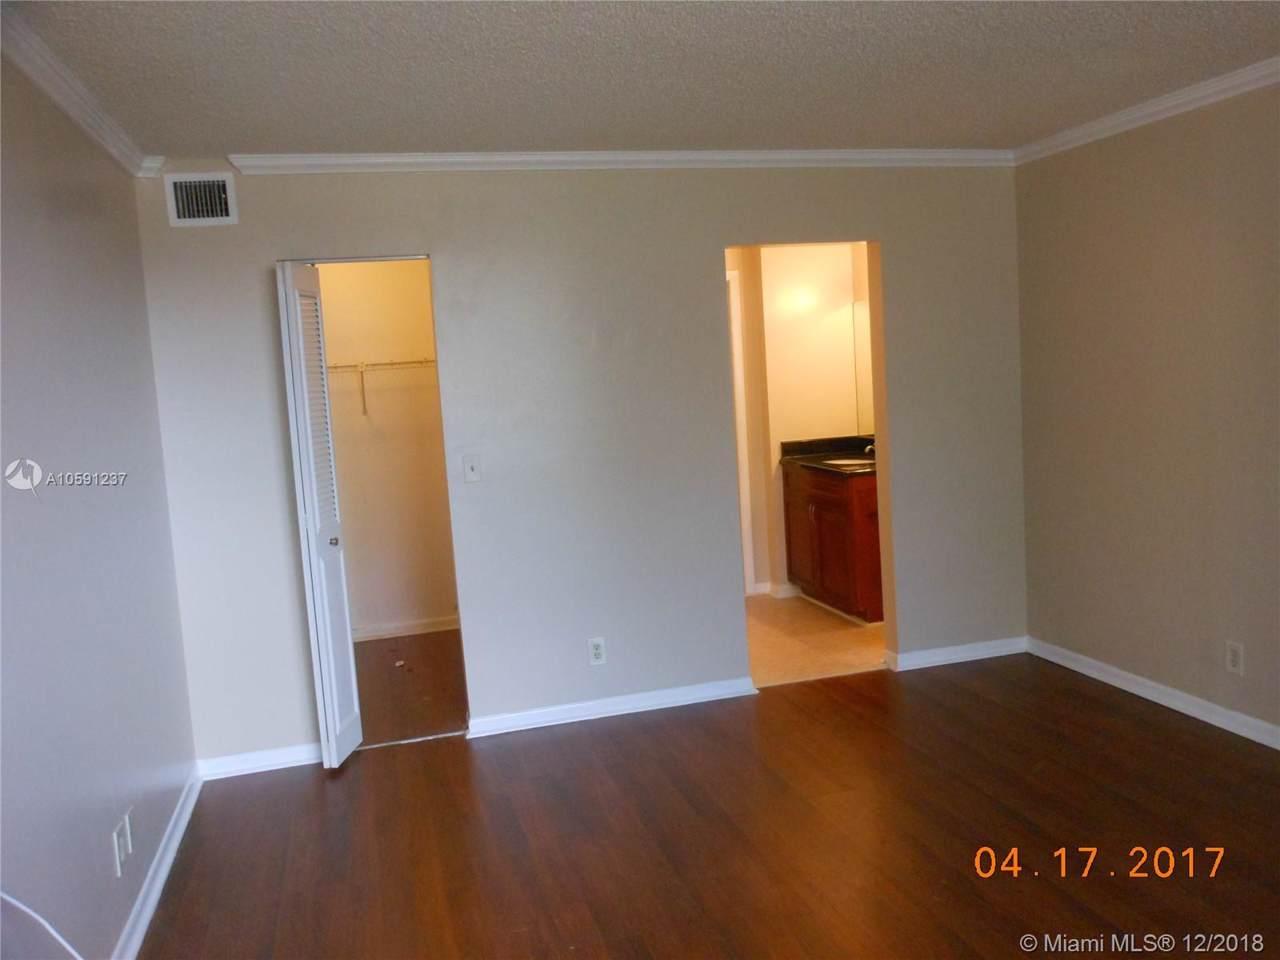 6475 Oakland Park Blvd - Photo 1